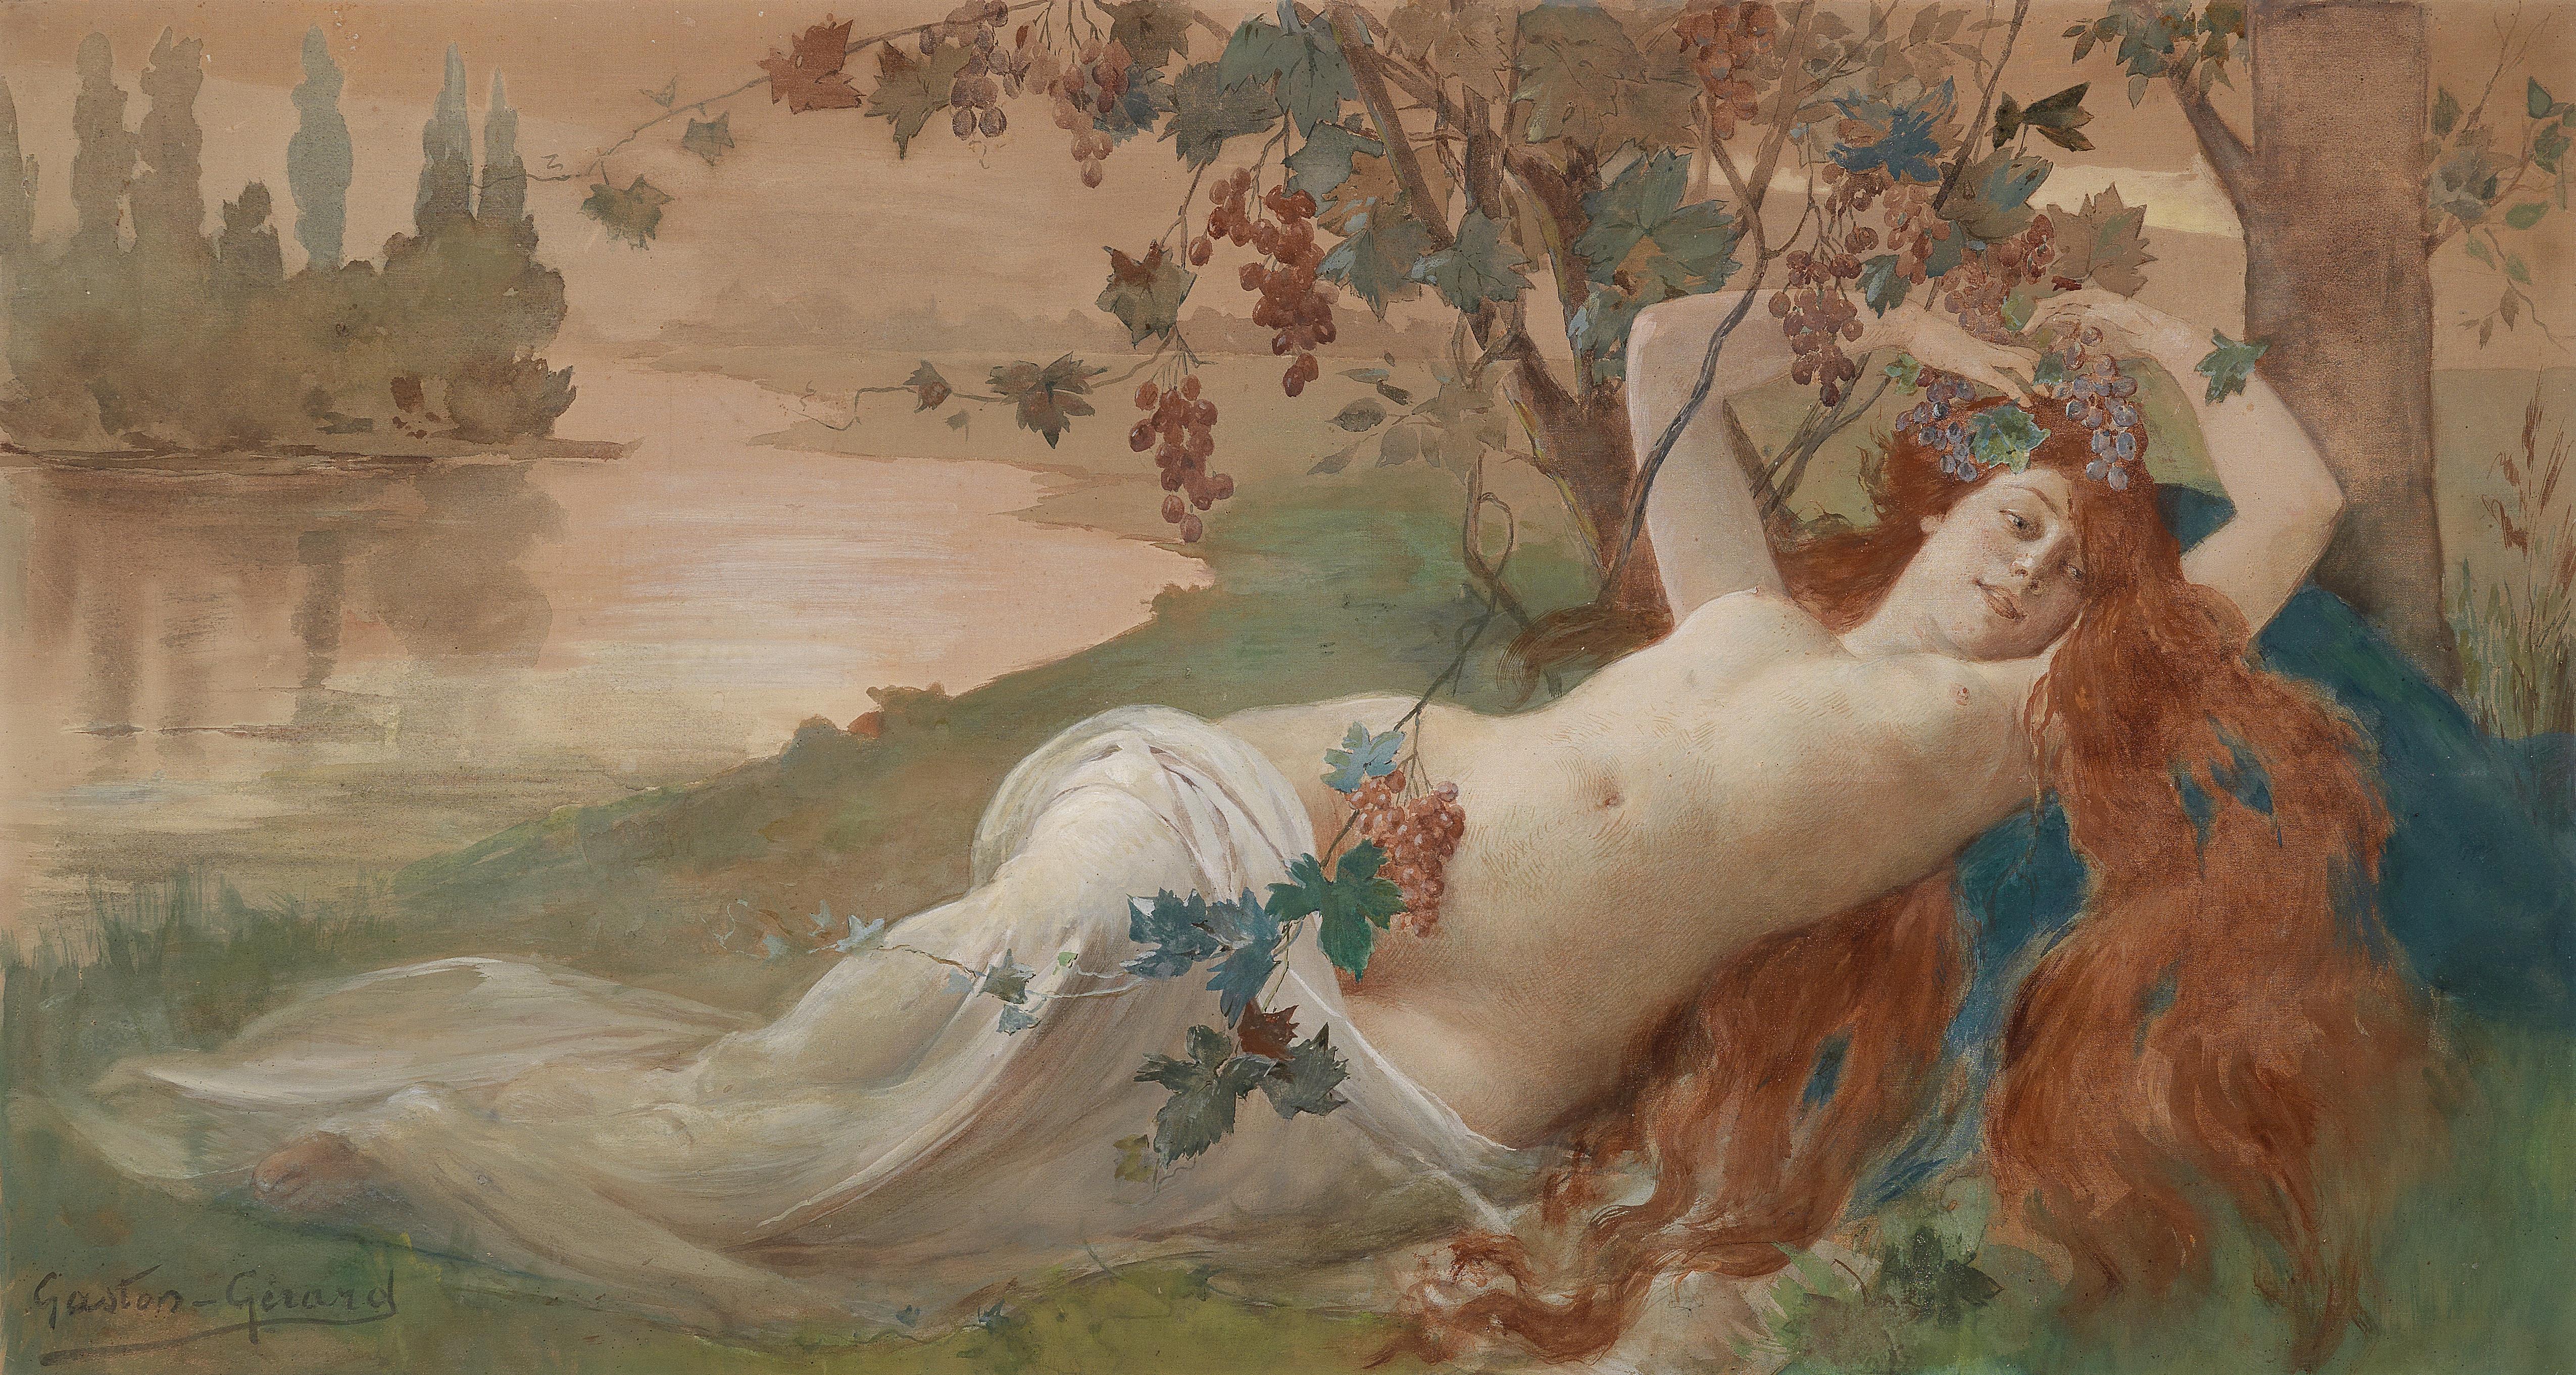 Louis Gaston Gerard, род в 1859. Осенняя красавица. 76 х 122 см. Частная коллекция